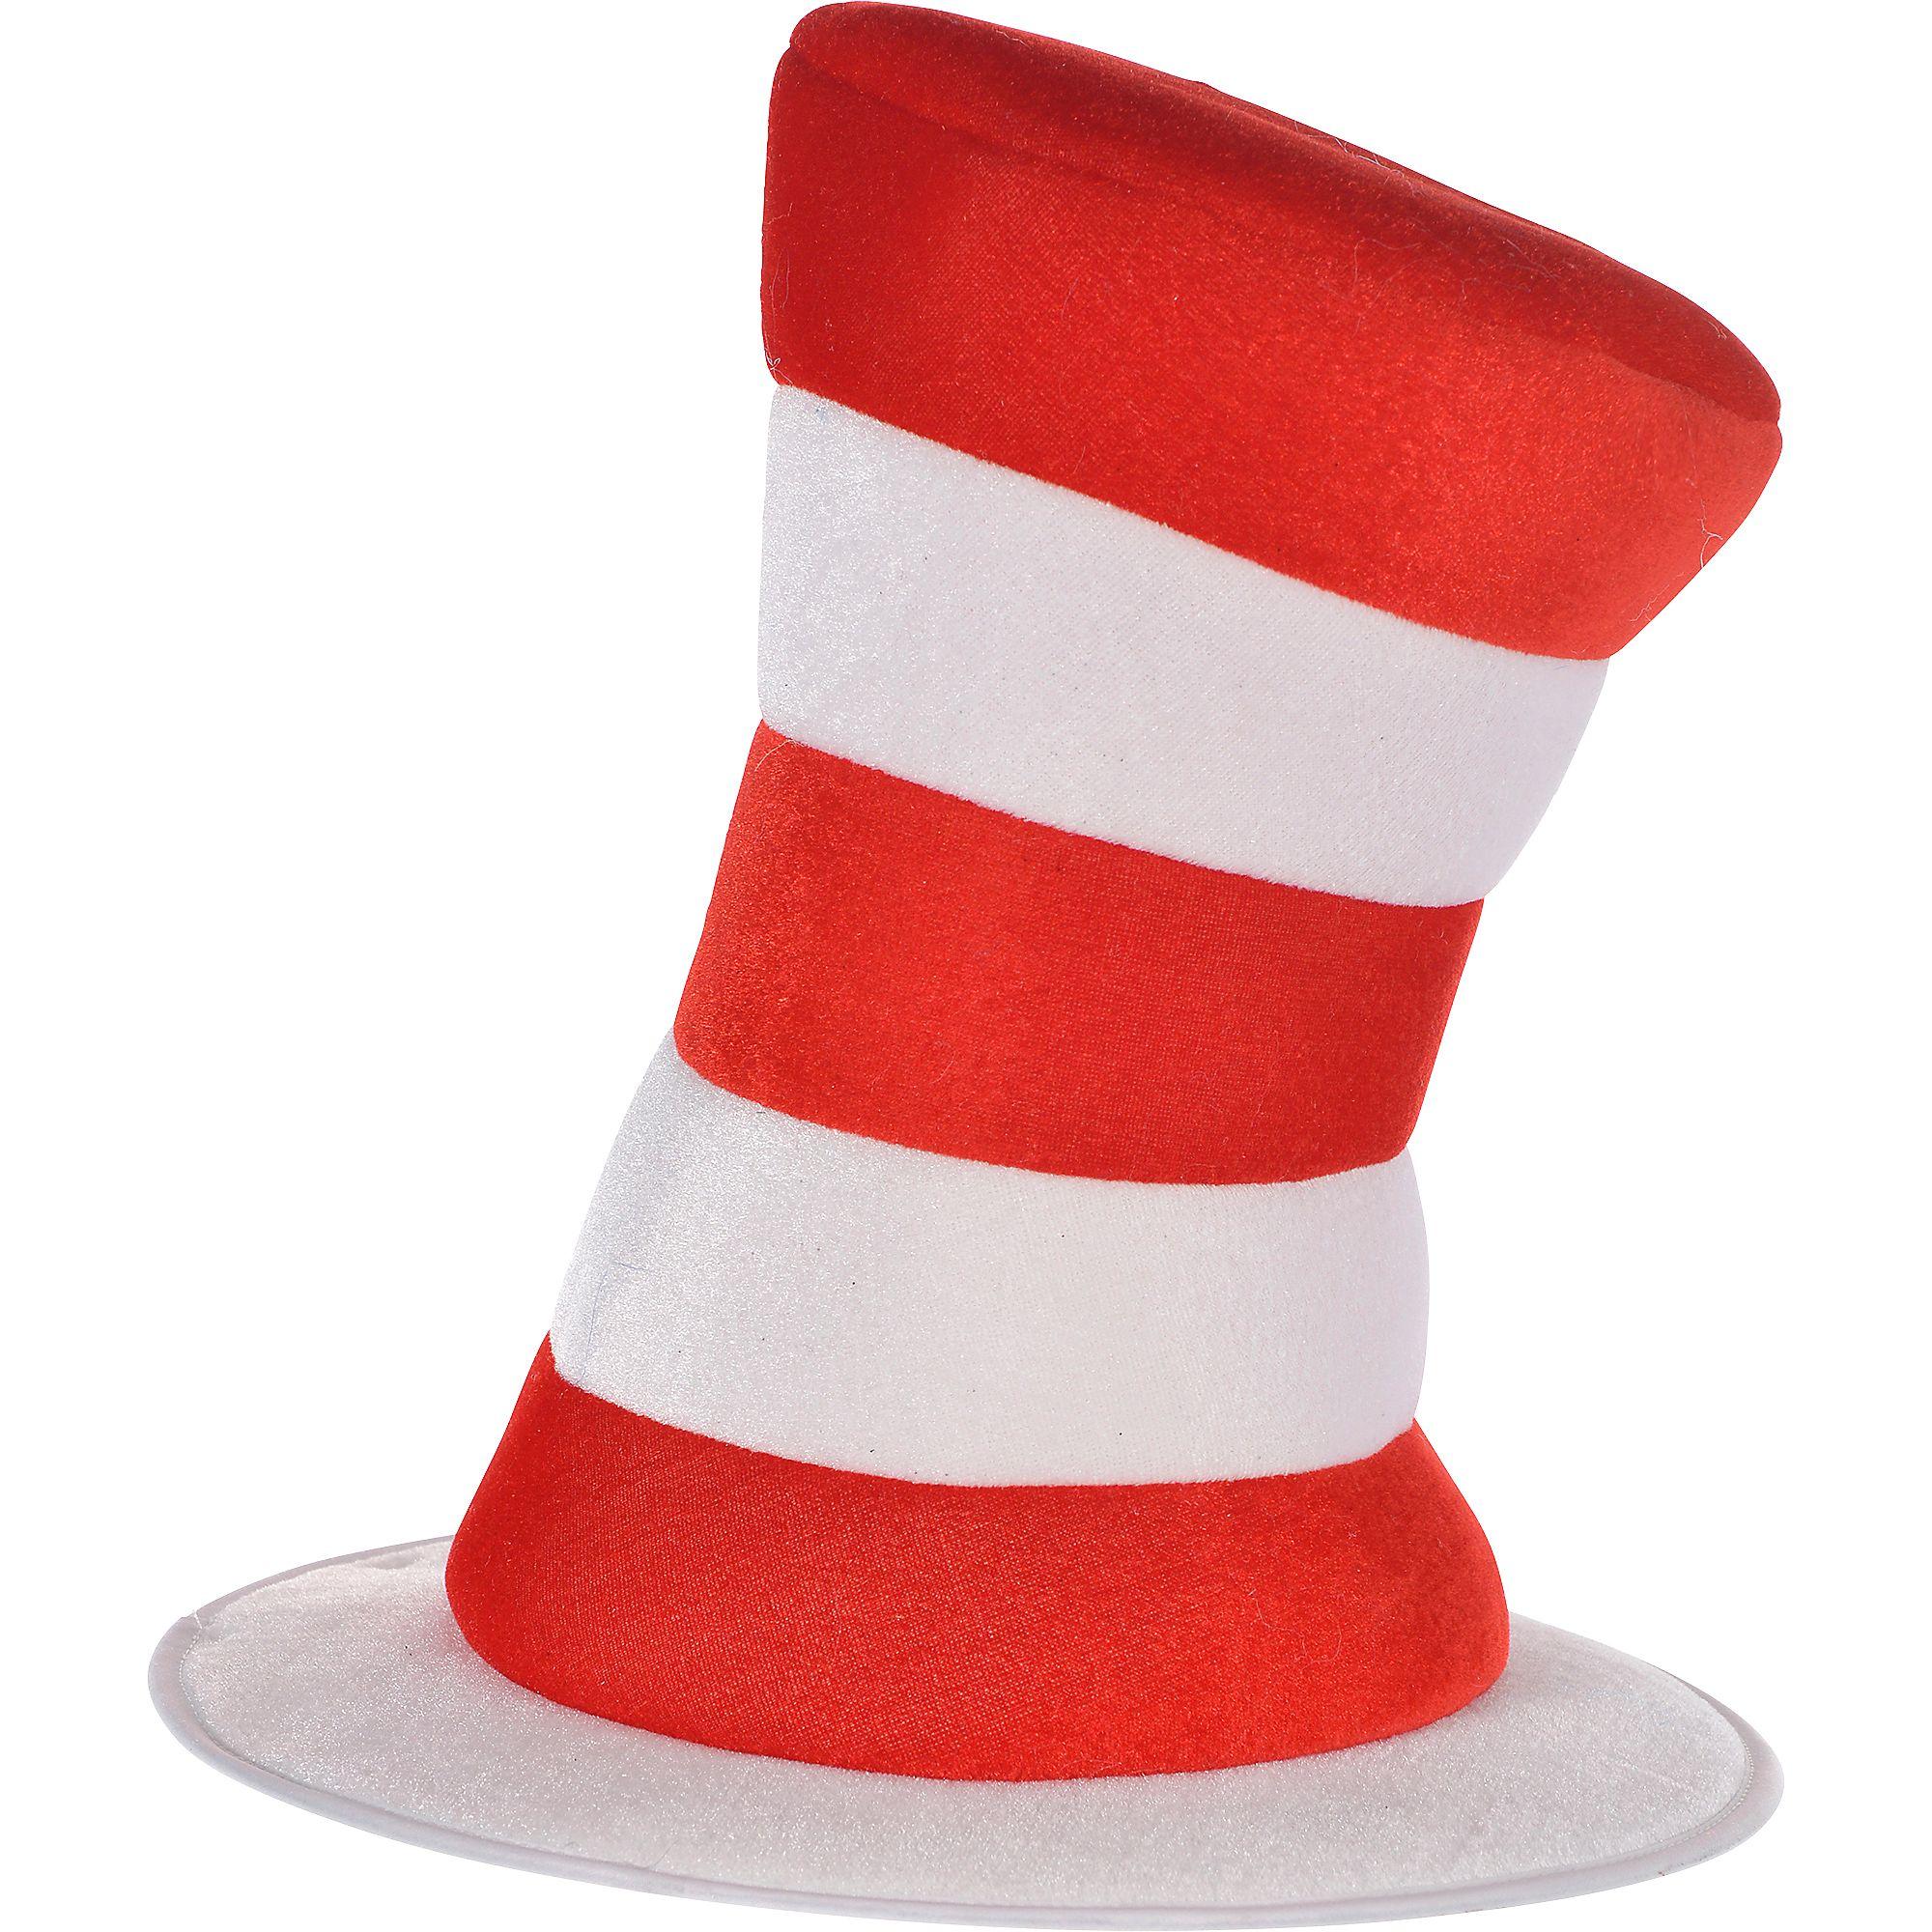 Adult Dr  Seuss Cat in the Hat Top Hat, Halloween Costume